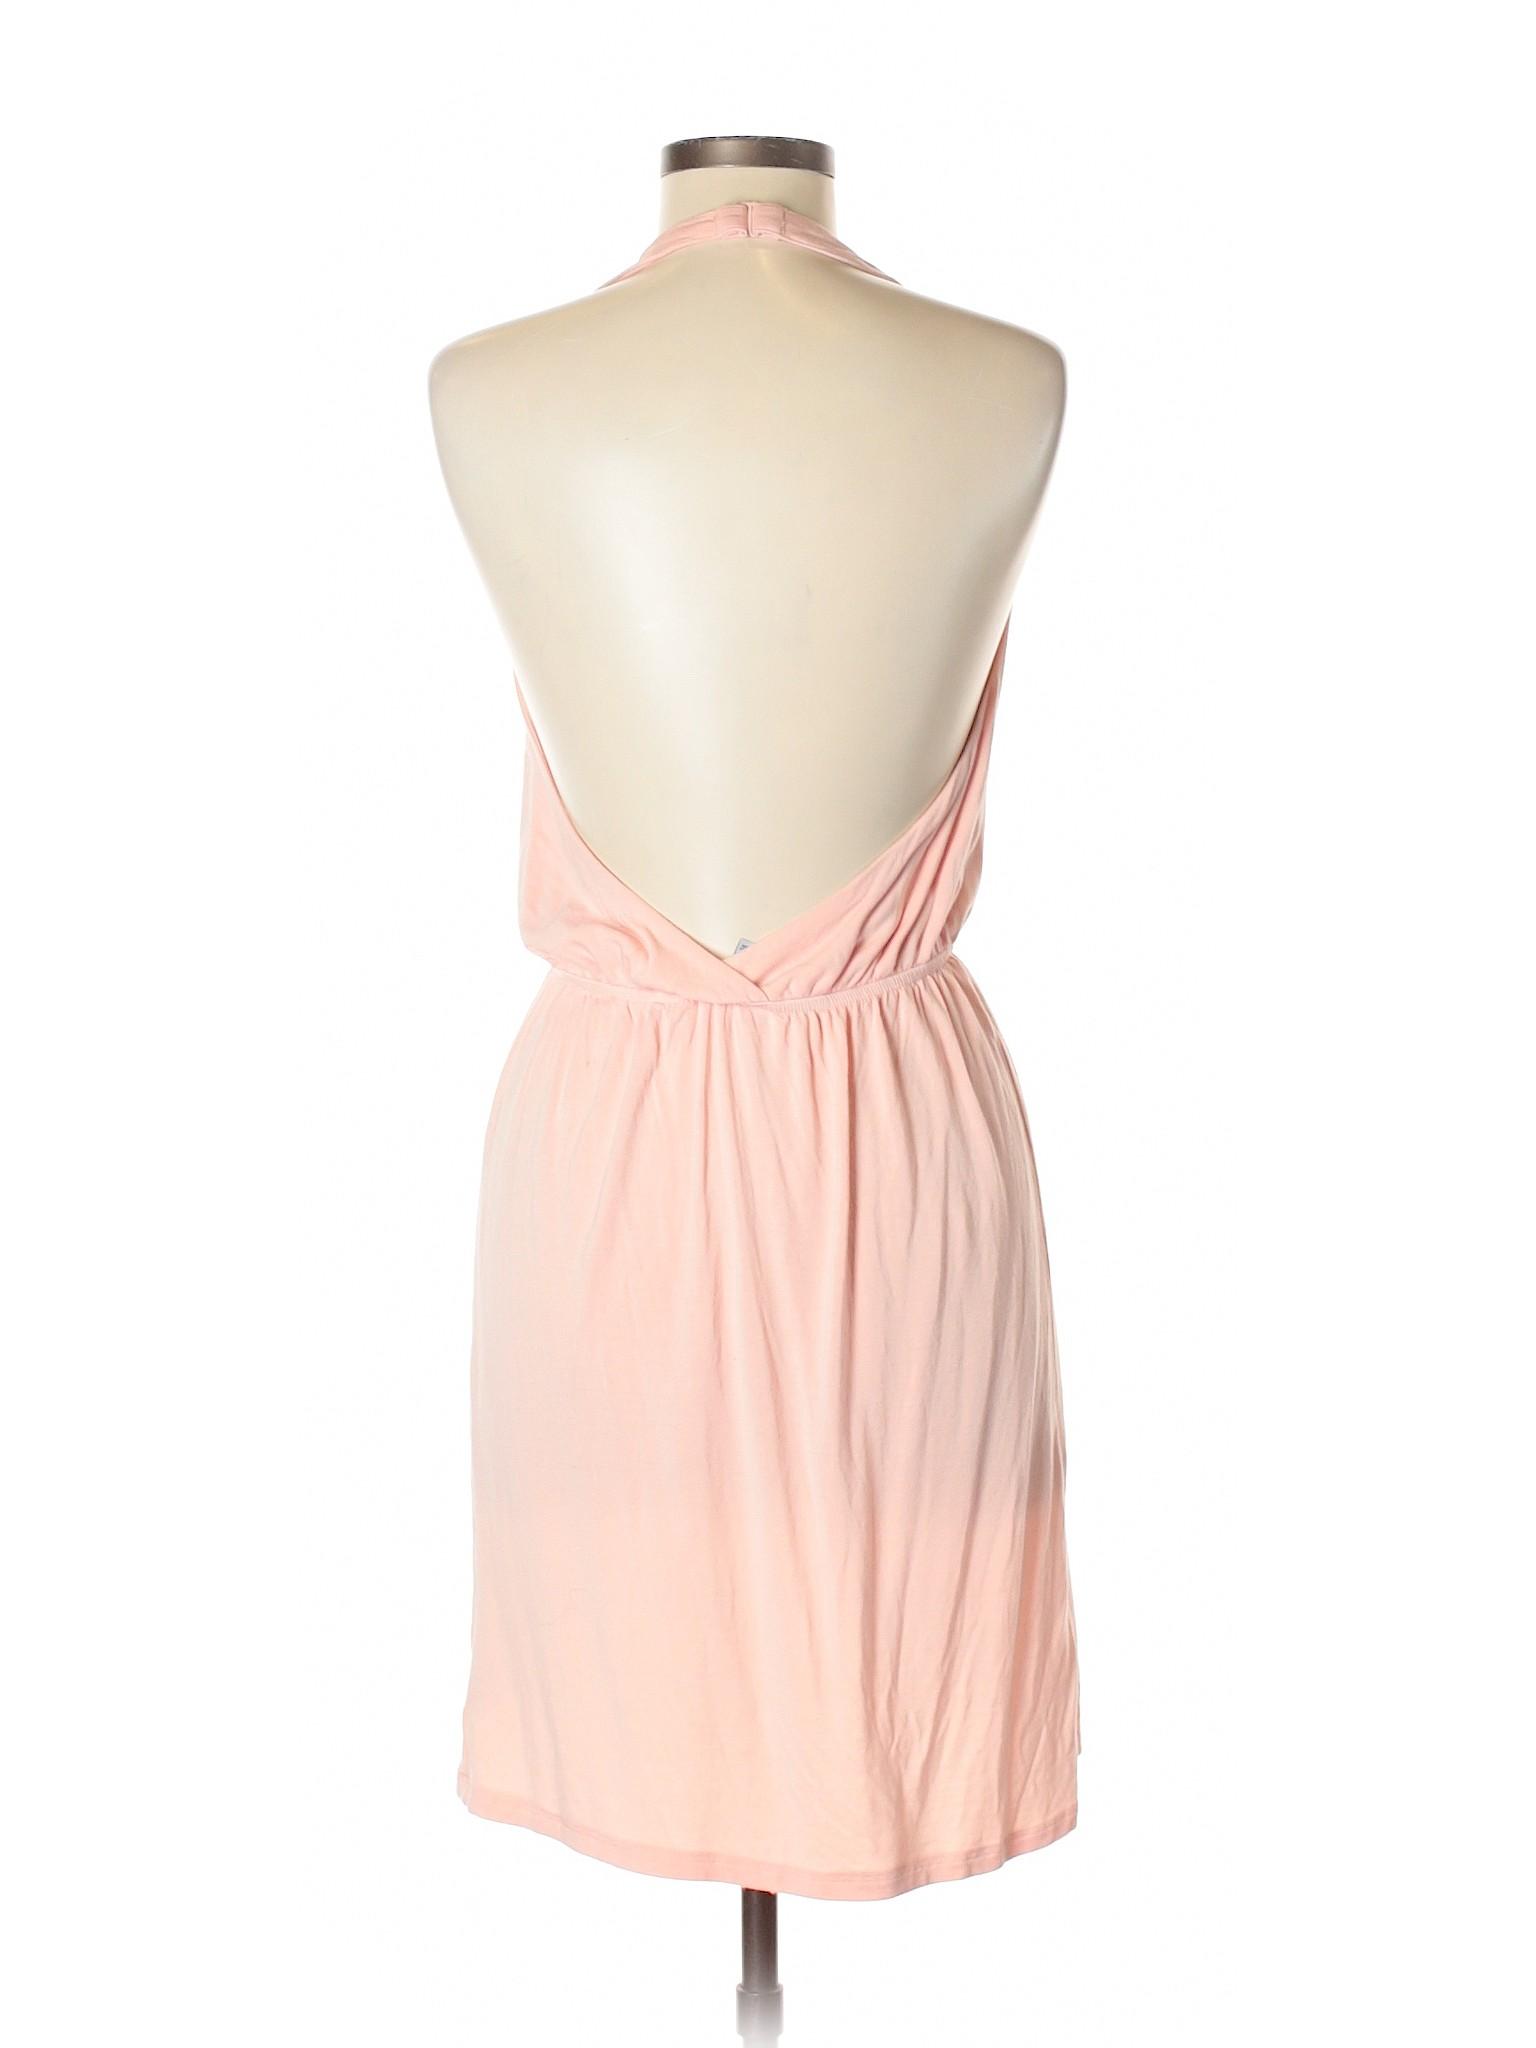 Selling TOBI Selling Casual Dress TOBI Selling Dress Casual TOBI TOBI Selling Casual Dress Casual Dress Selling wqA5gAnt